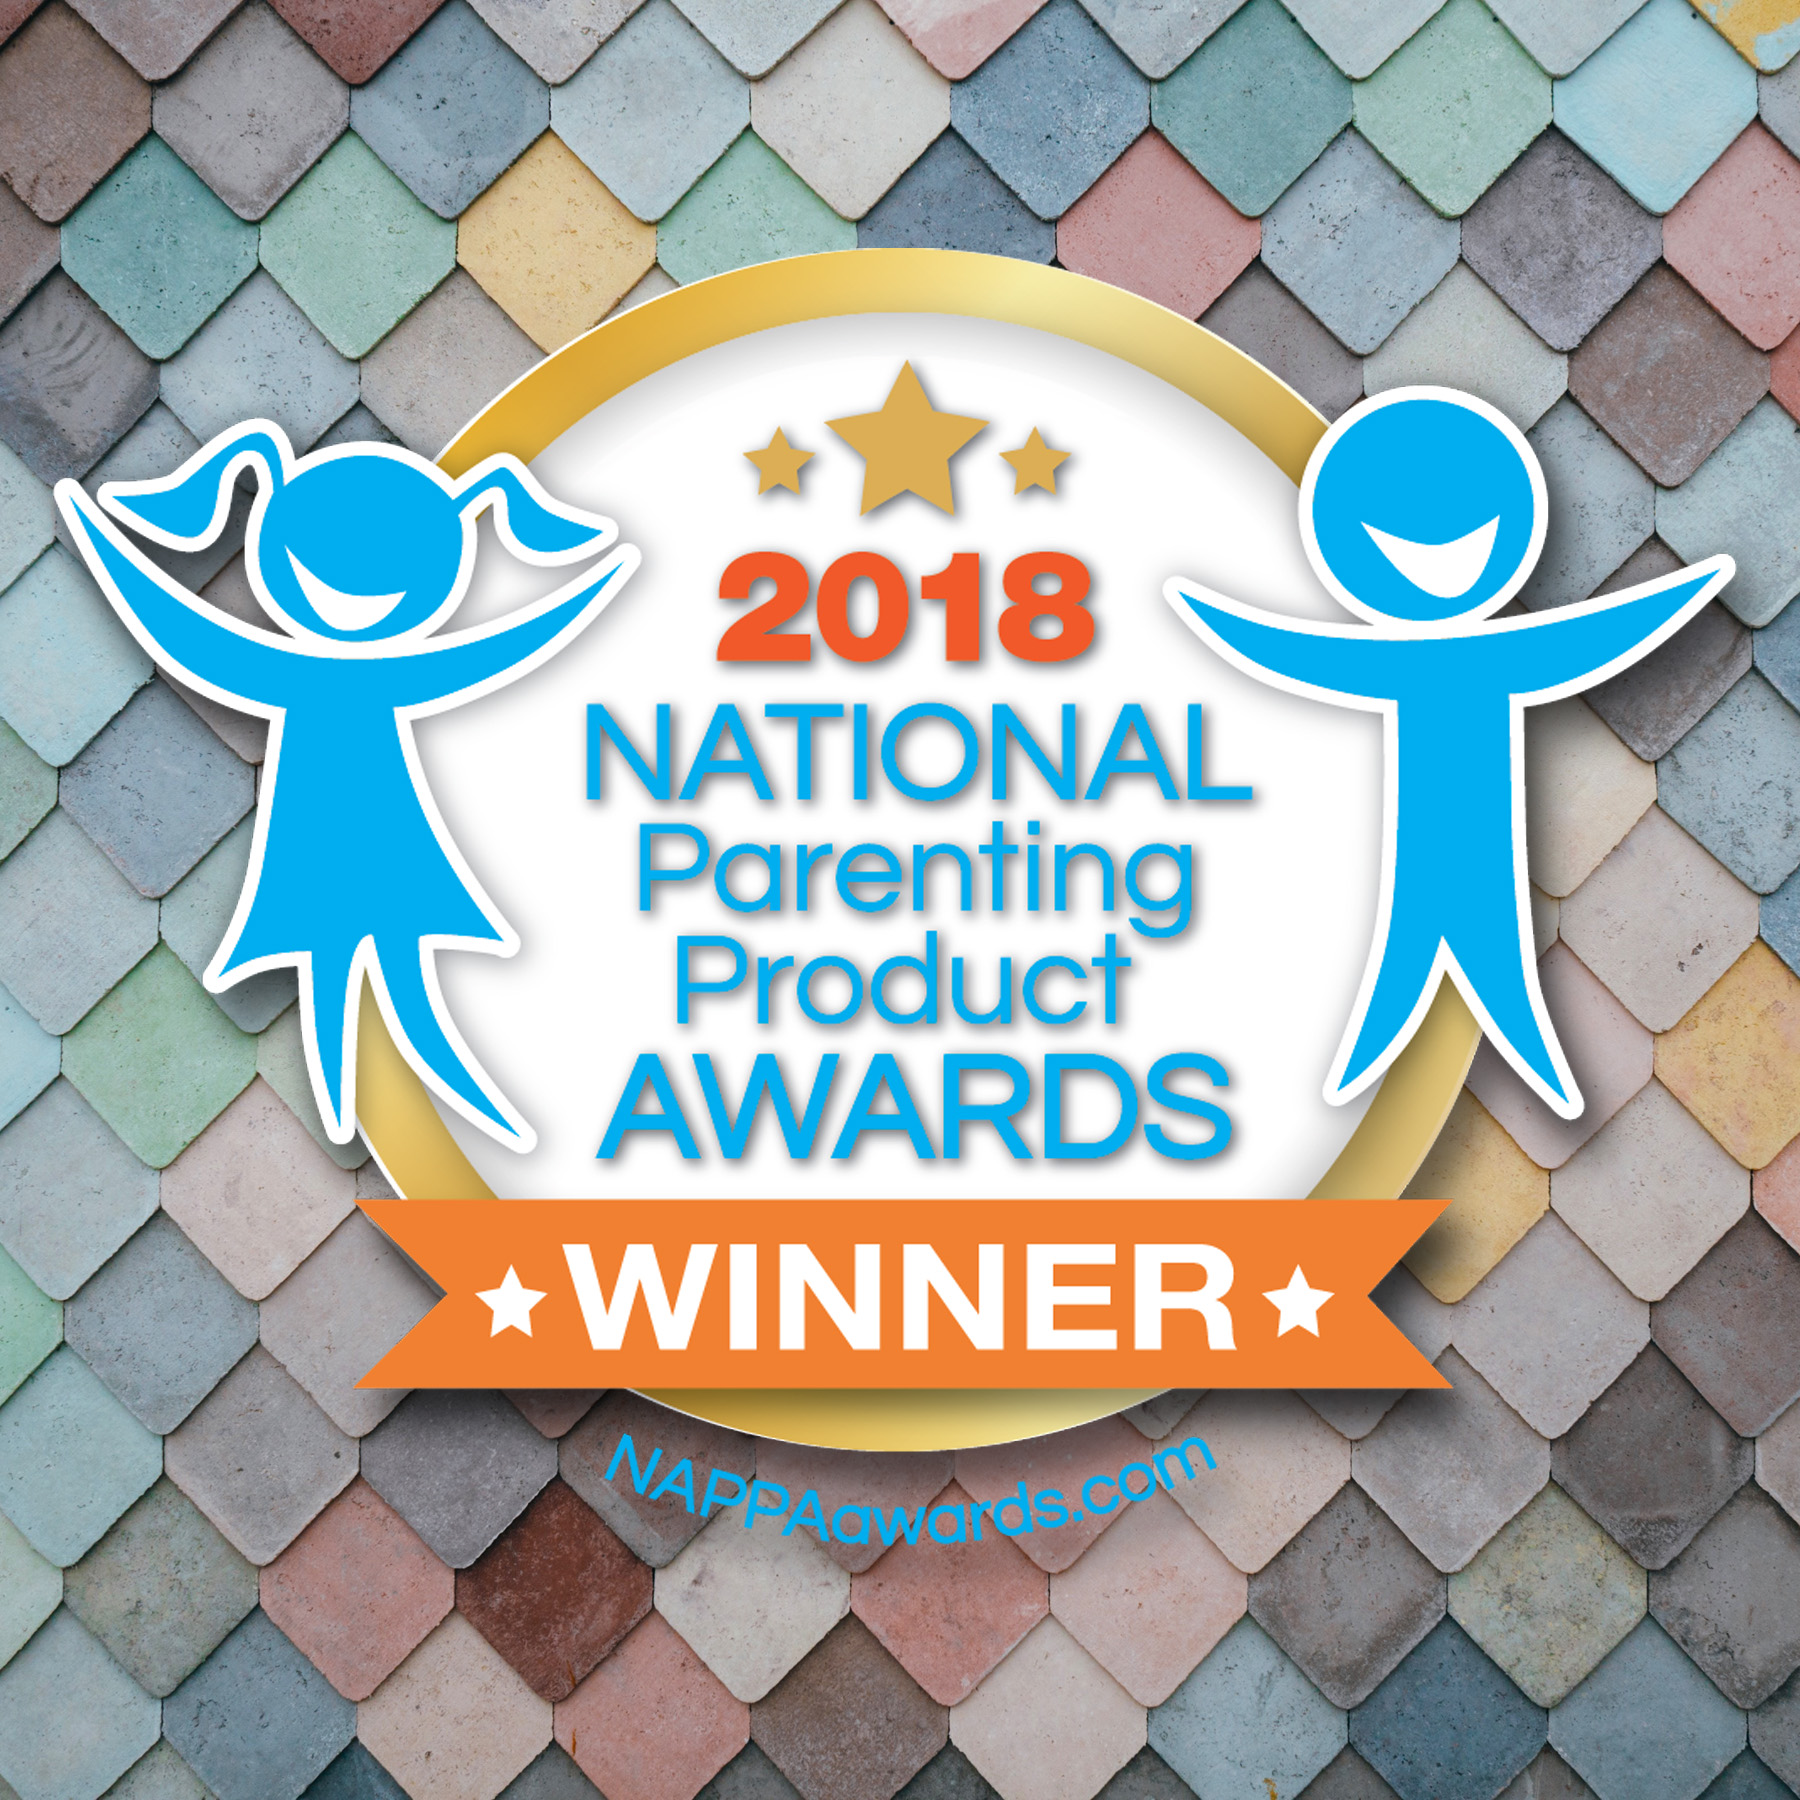 Candygrams-Family-Board-Games-Word-Game-Award-Winning-Gift-NAAPA-Unsplash.jpg